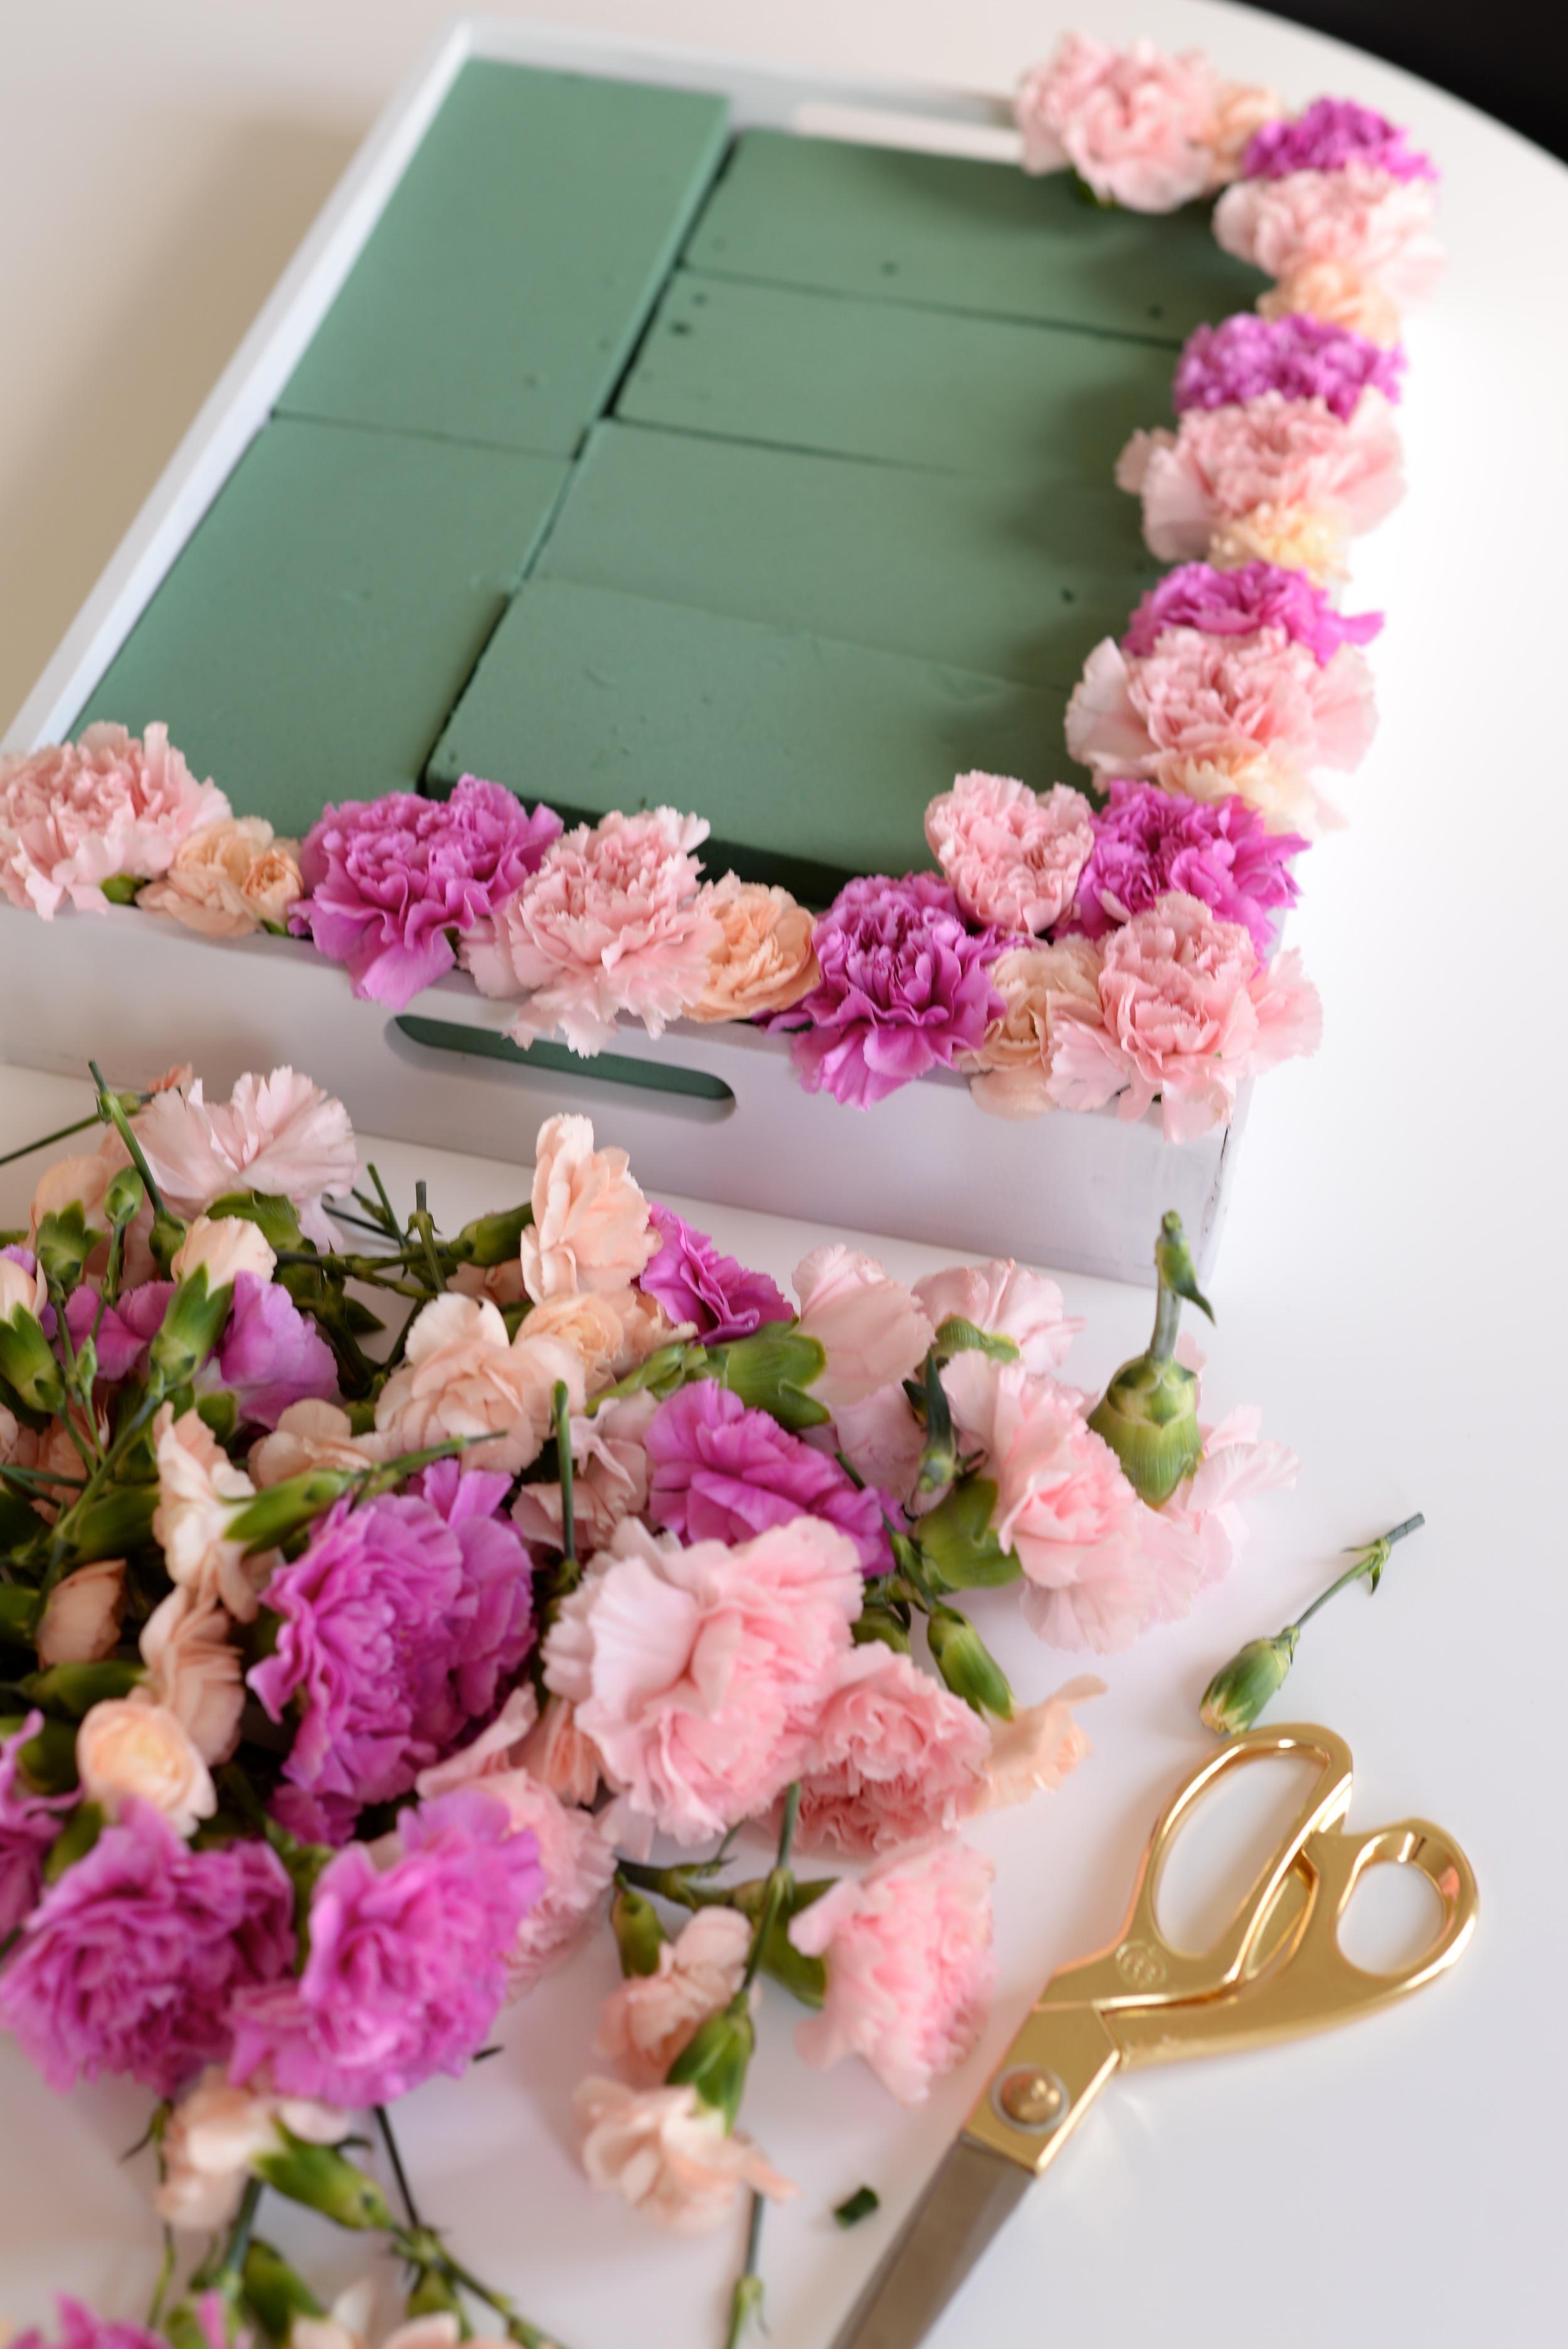 Floral centerpiece DIY